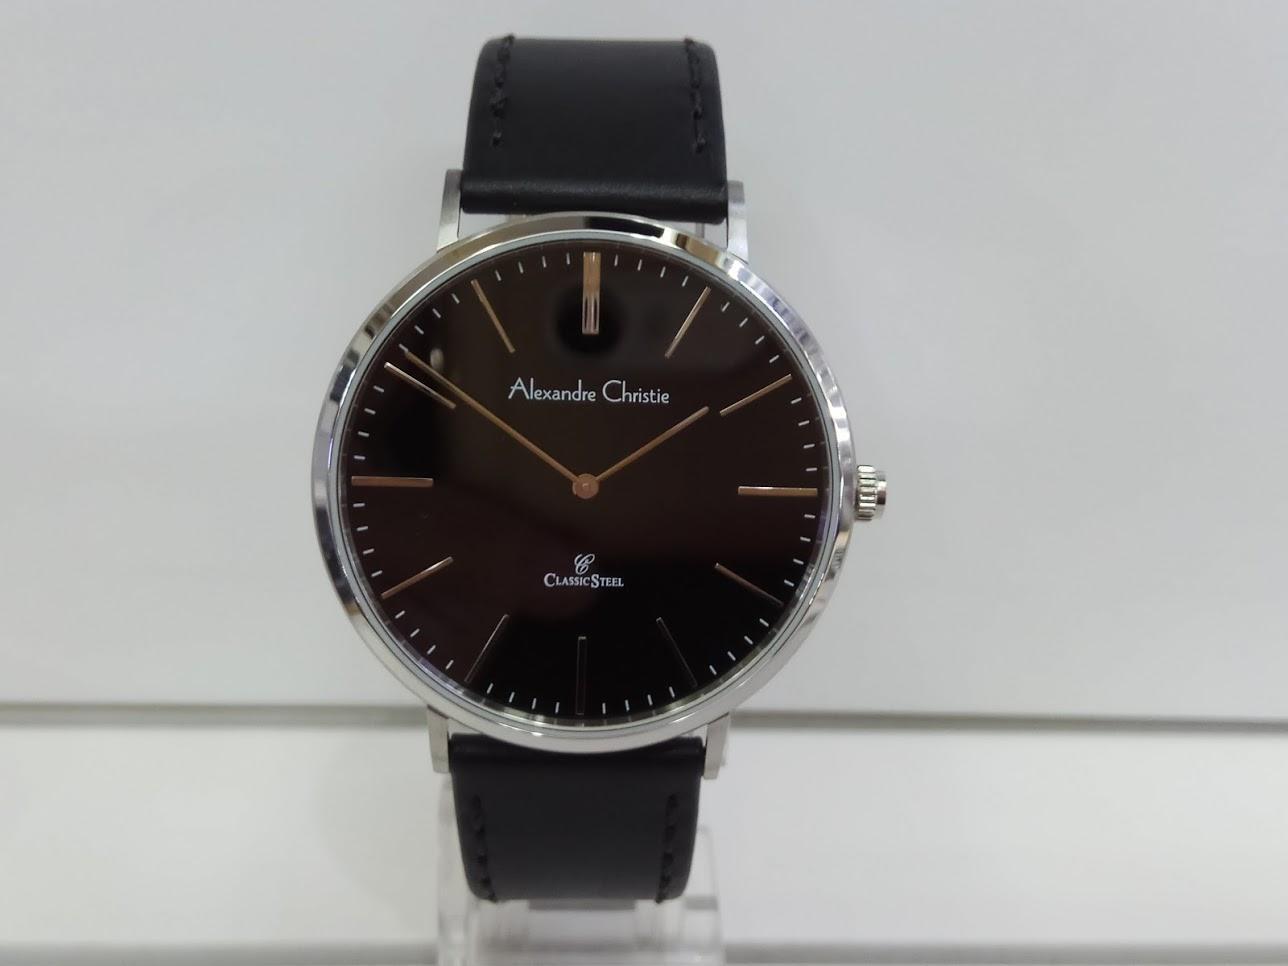 Alexandre Christie Jam Tangan Pria Alexandre Christie AC8490MH Classic  Silver Black Leather Strap b4d6e5c9e6